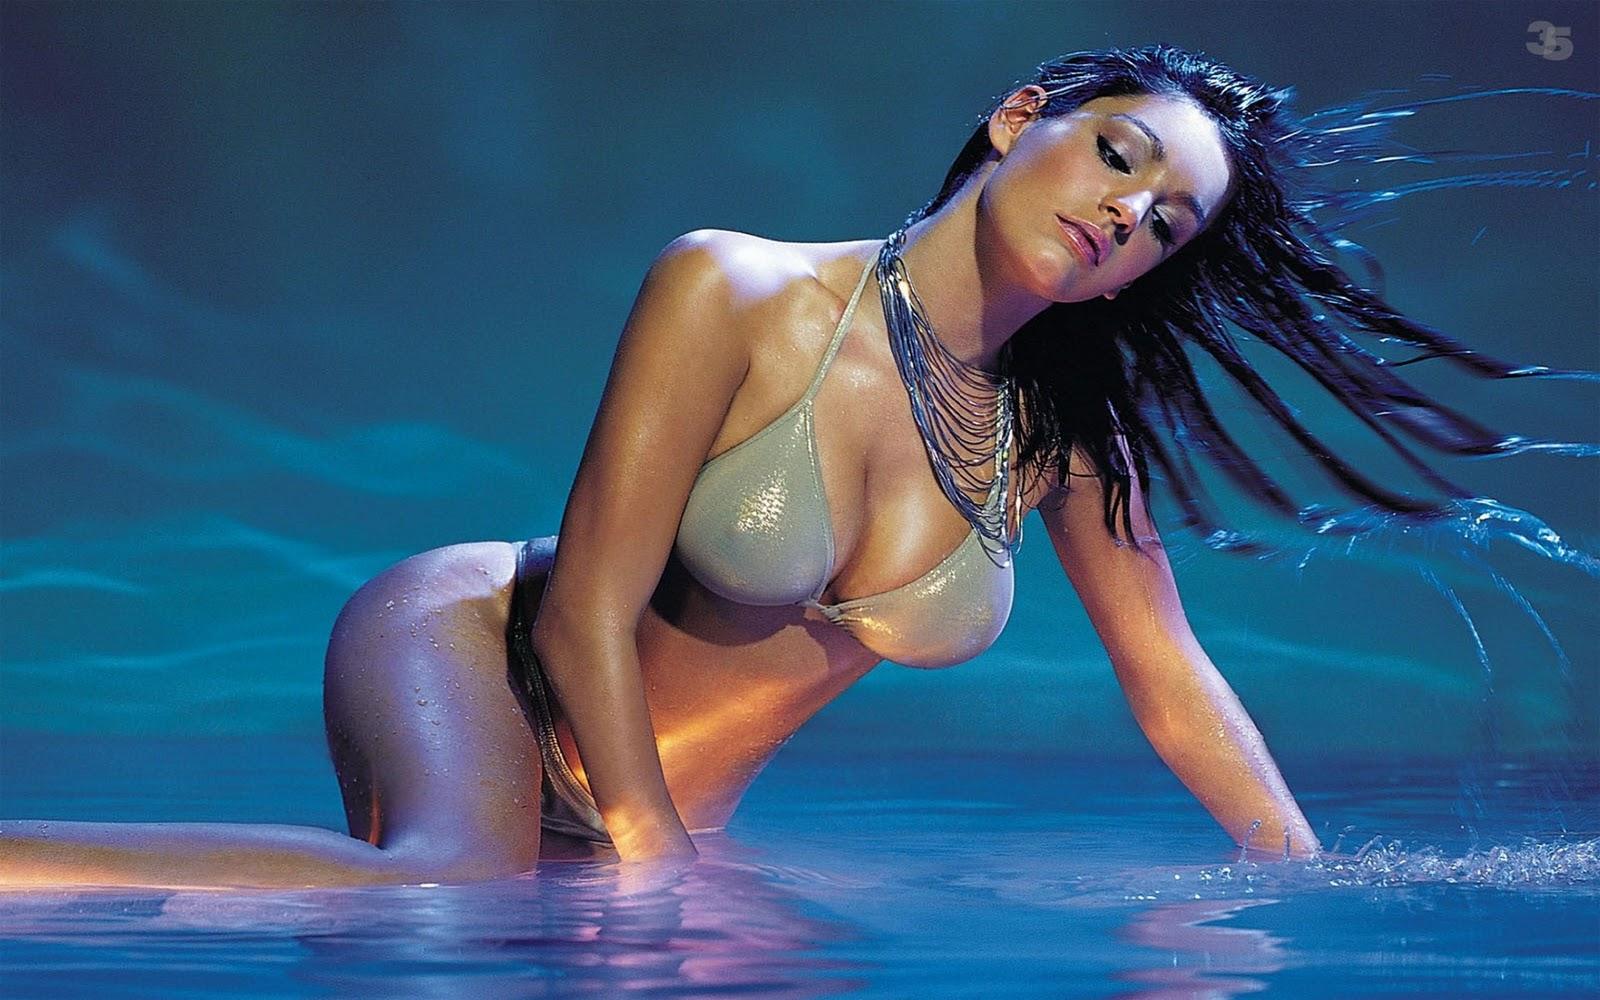 http://4.bp.blogspot.com/_HgT0gYsPNwU/TLYsTVxR-pI/AAAAAAAAADo/urR6jTcghr8/s1600/Kelly-032-Brook-032-Hot-032-in-032-Bikini-1920x1200.jpg